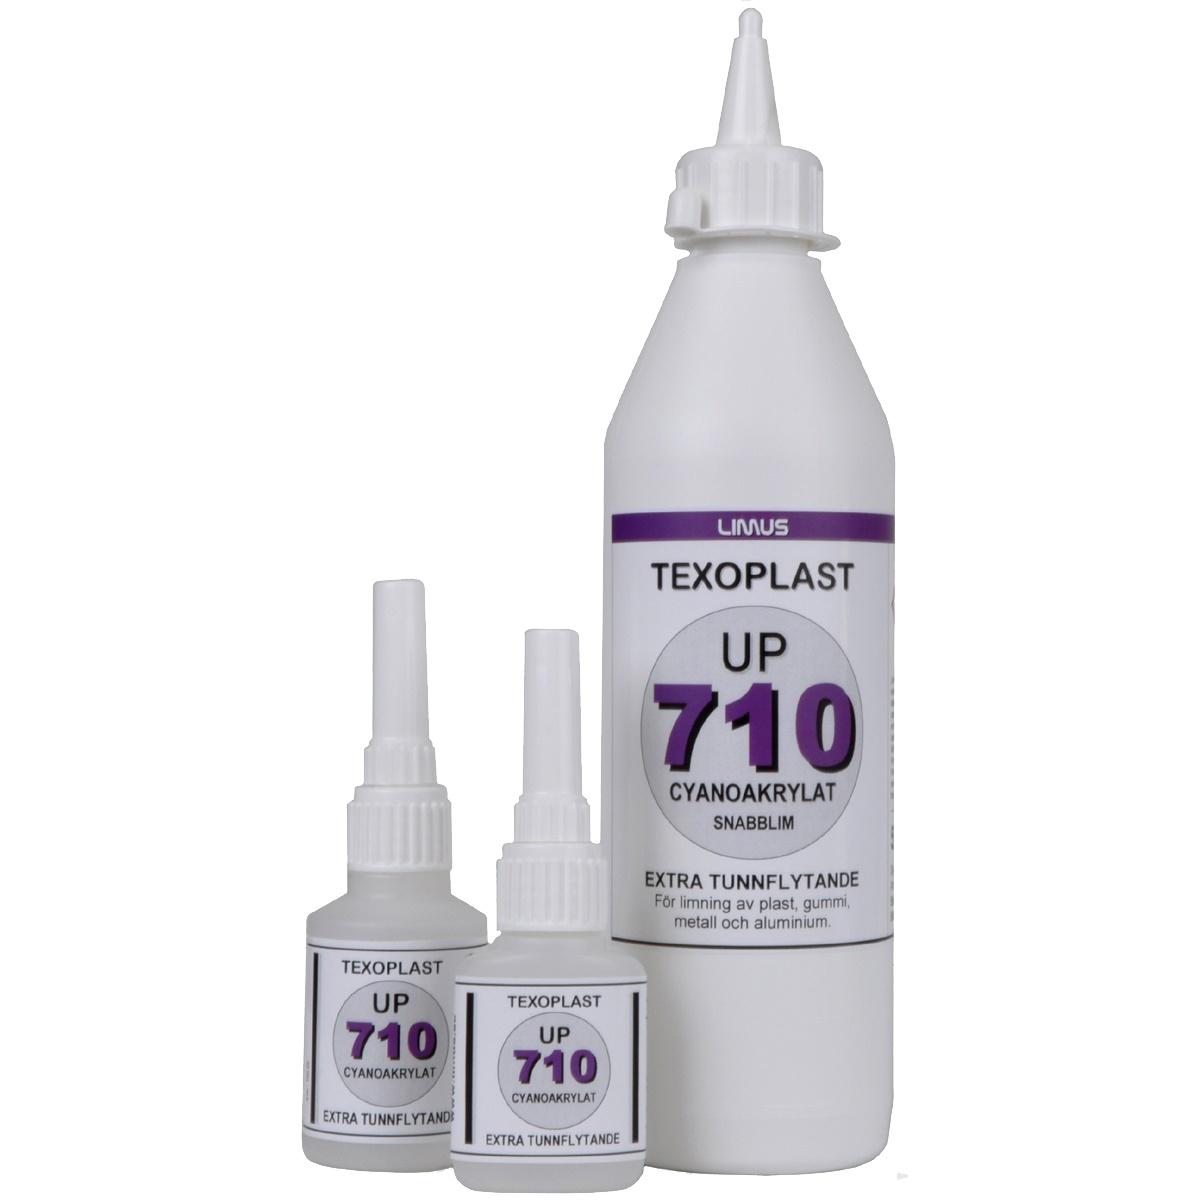 TEXOPLAST UP710